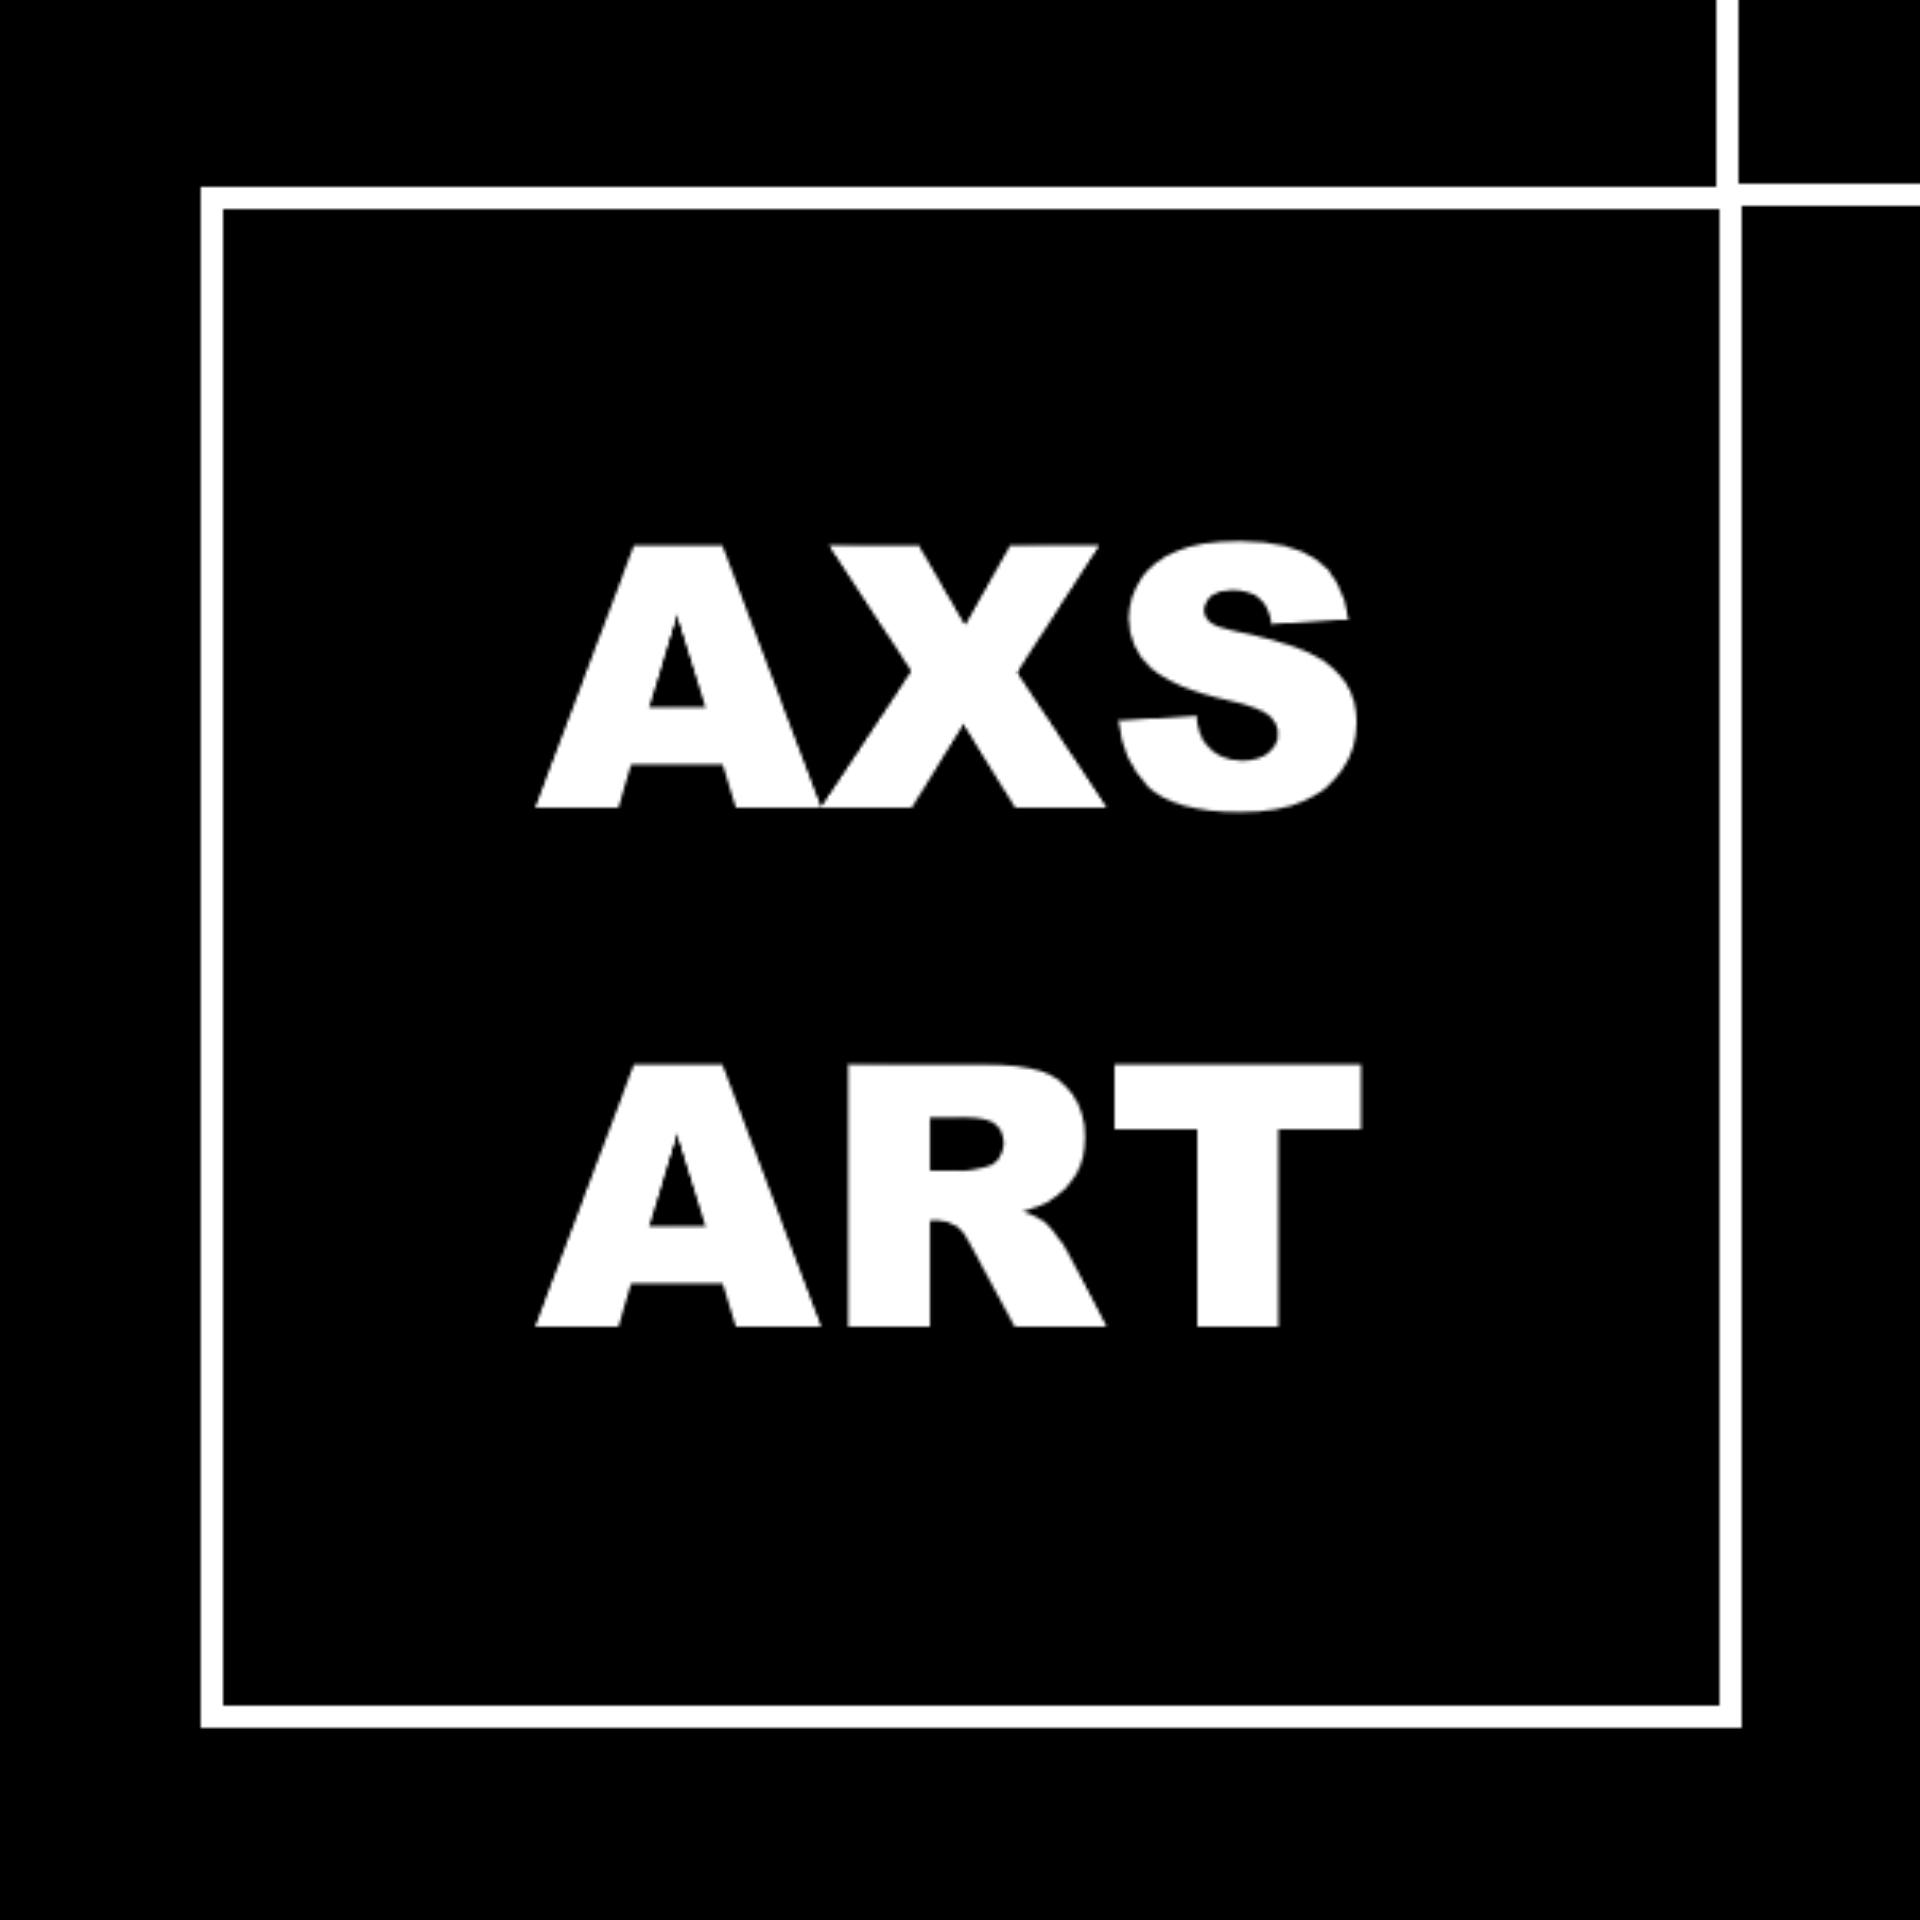 axs art logo.jpg